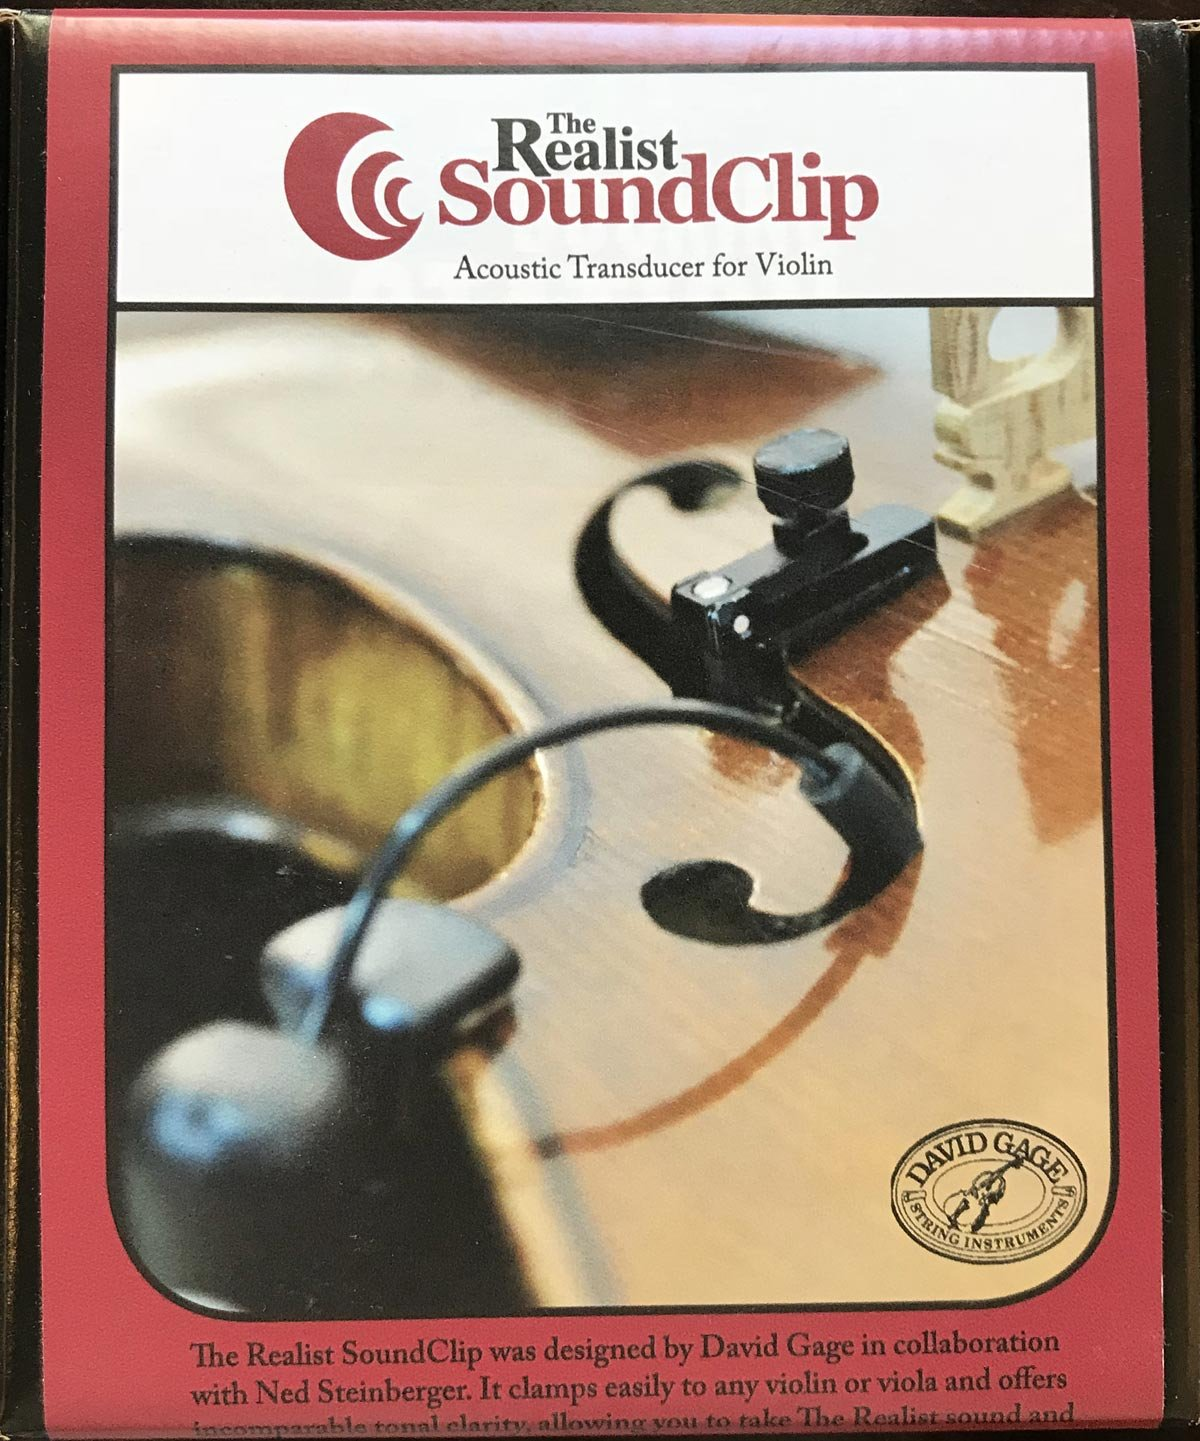 Realist SoundClip for Violin and Viola